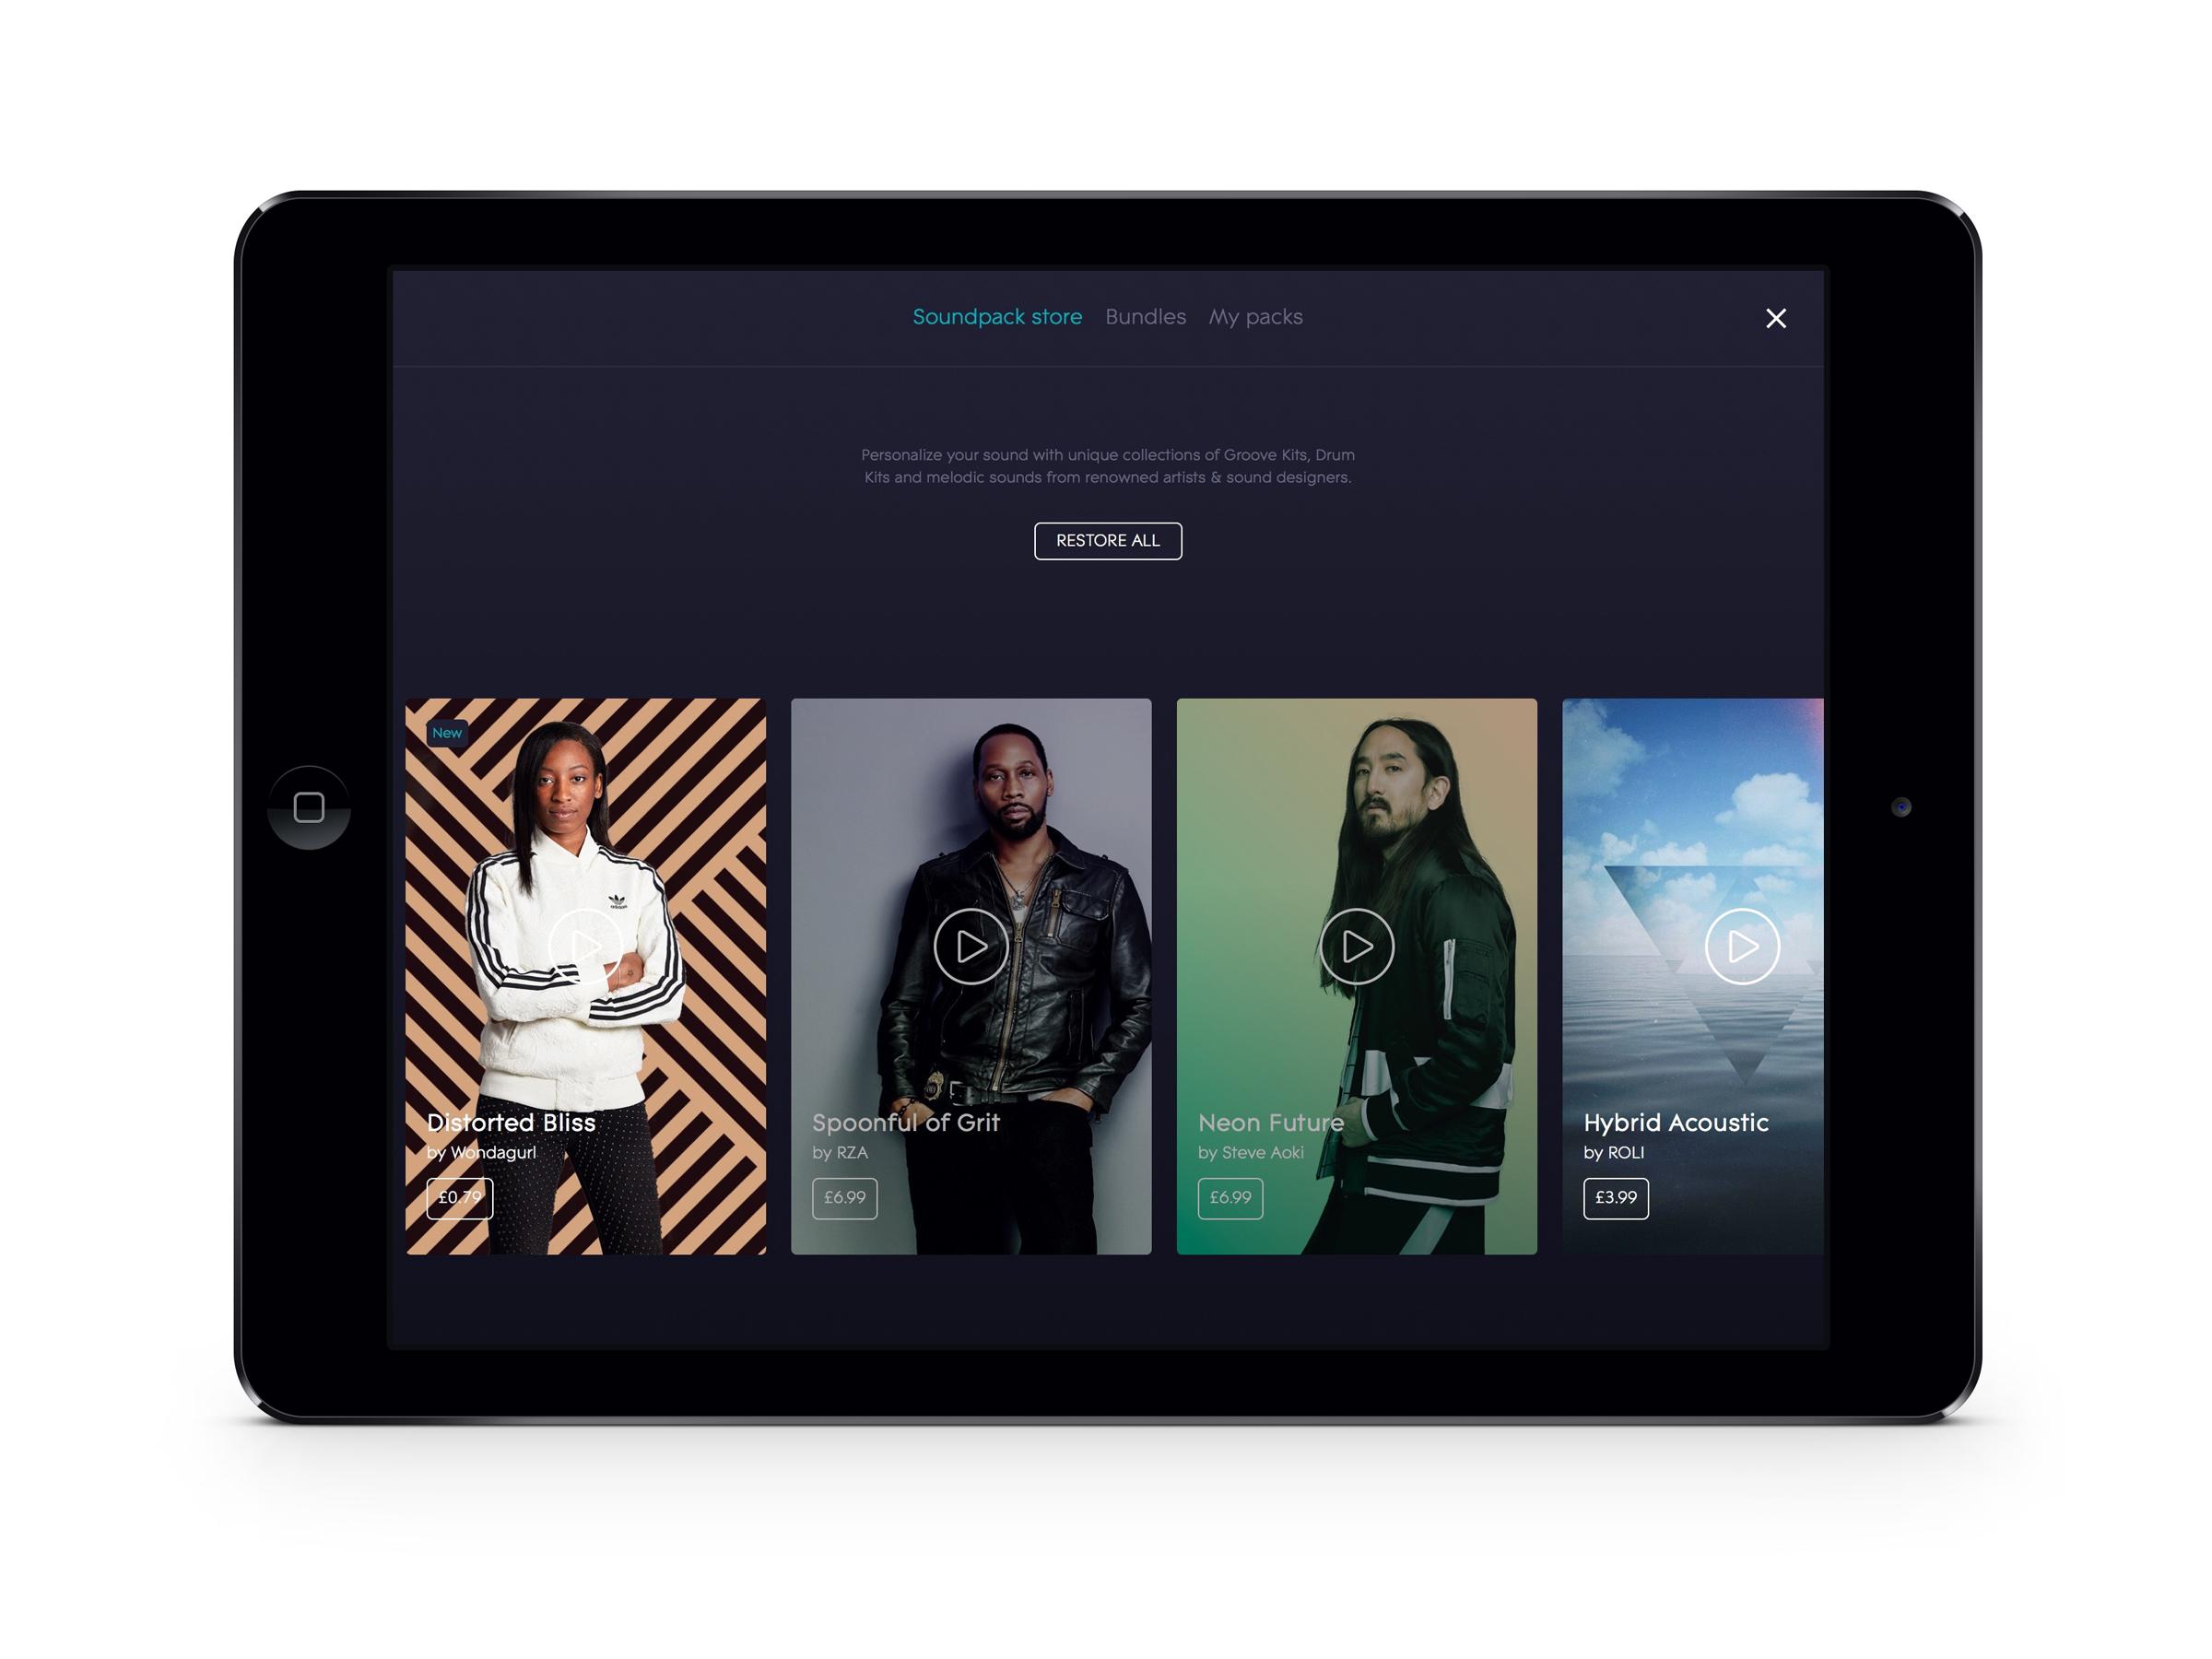 WondaGurl blog iPad Soundpack Store image